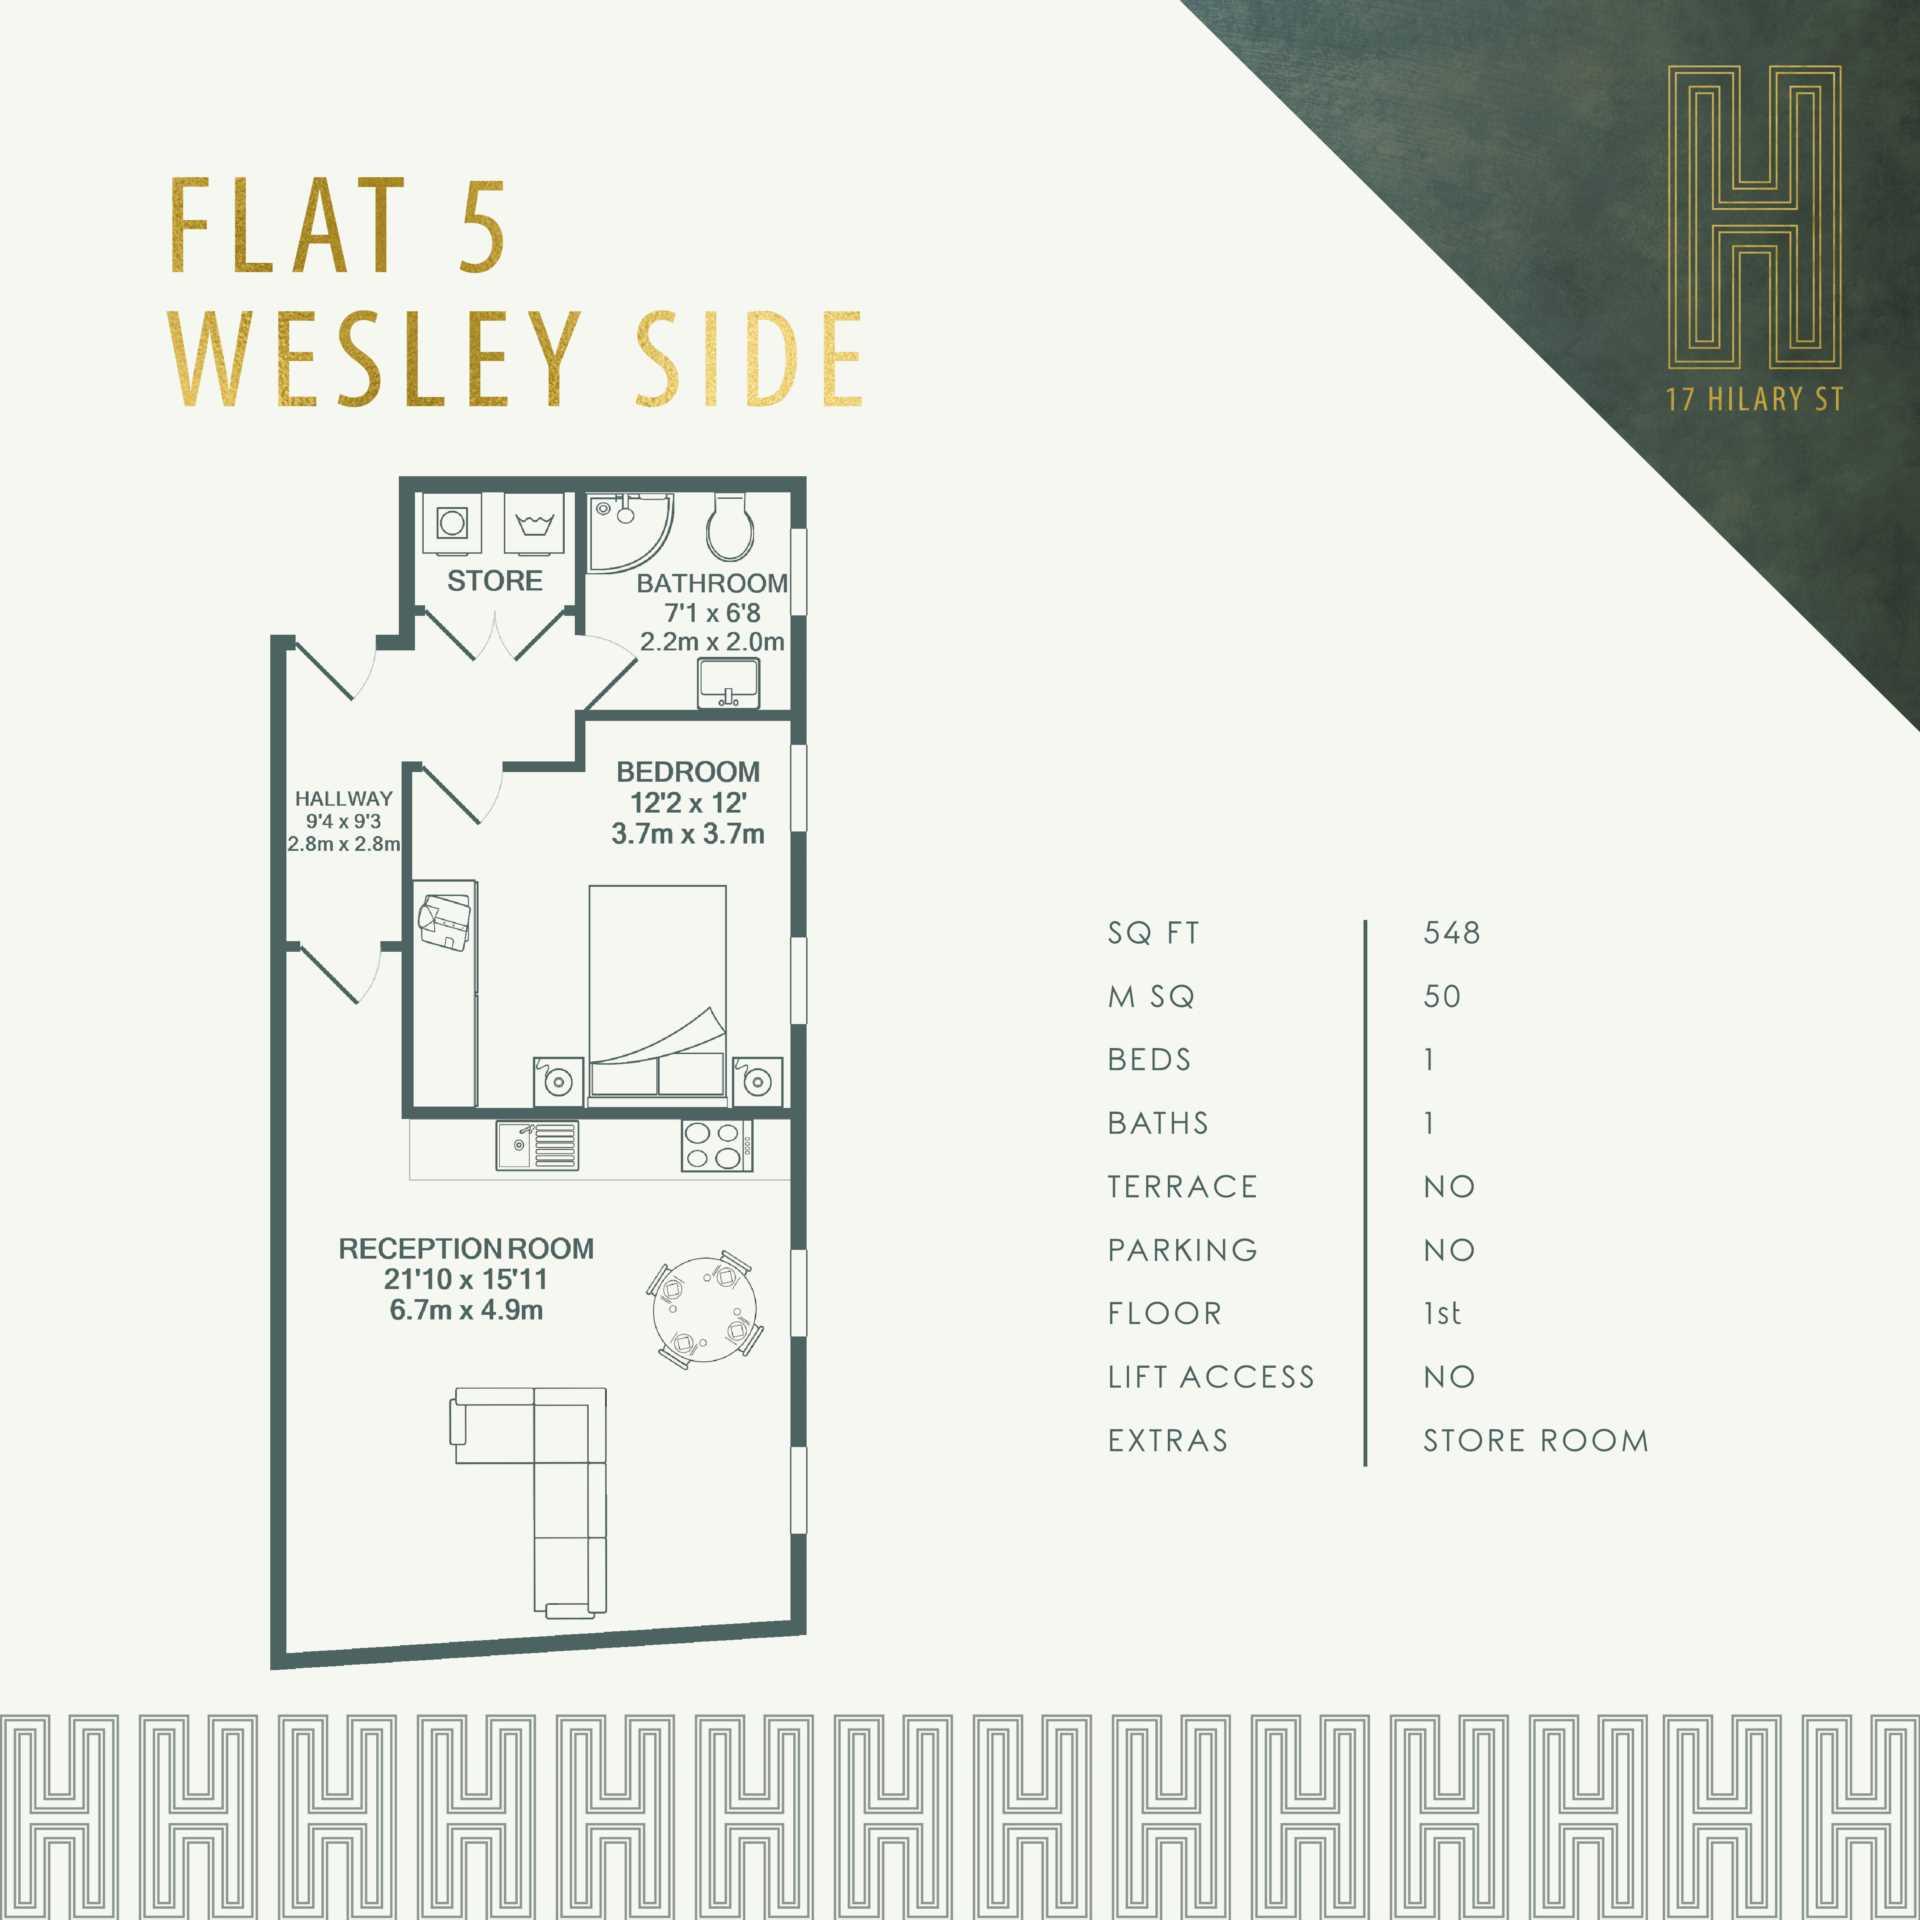 Flat 5, WS, 17 Hilary Street, Image 3